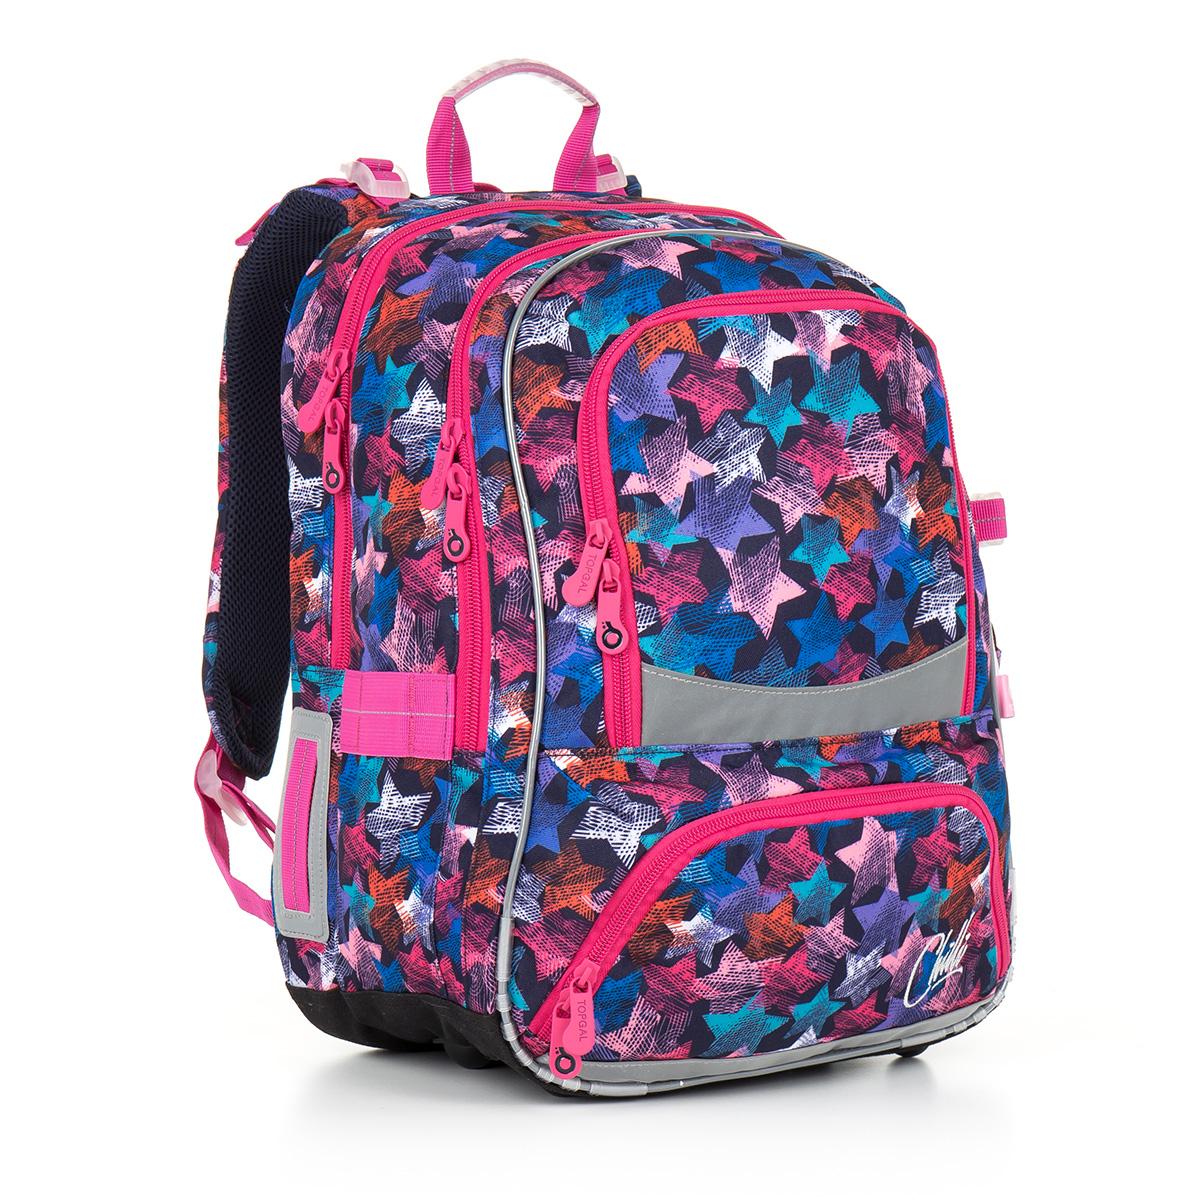 Topgal školní batoh CHI 867 D - Blue